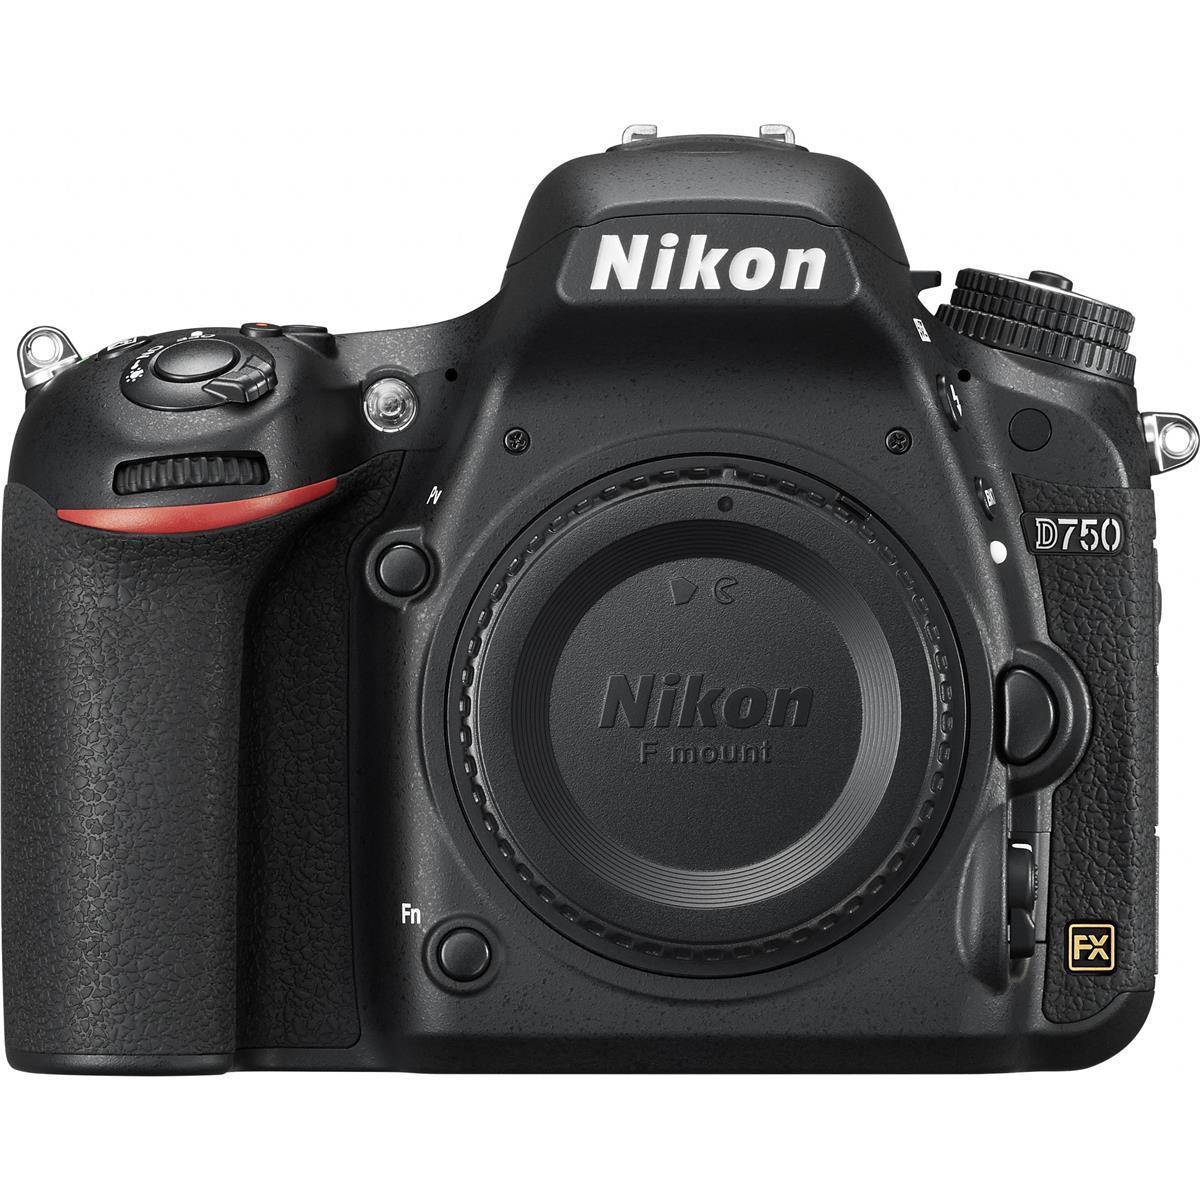 Nikon D750 Full Frame DSLR Camera (Body Only, Refurbished)  $1399 + Free Shipping